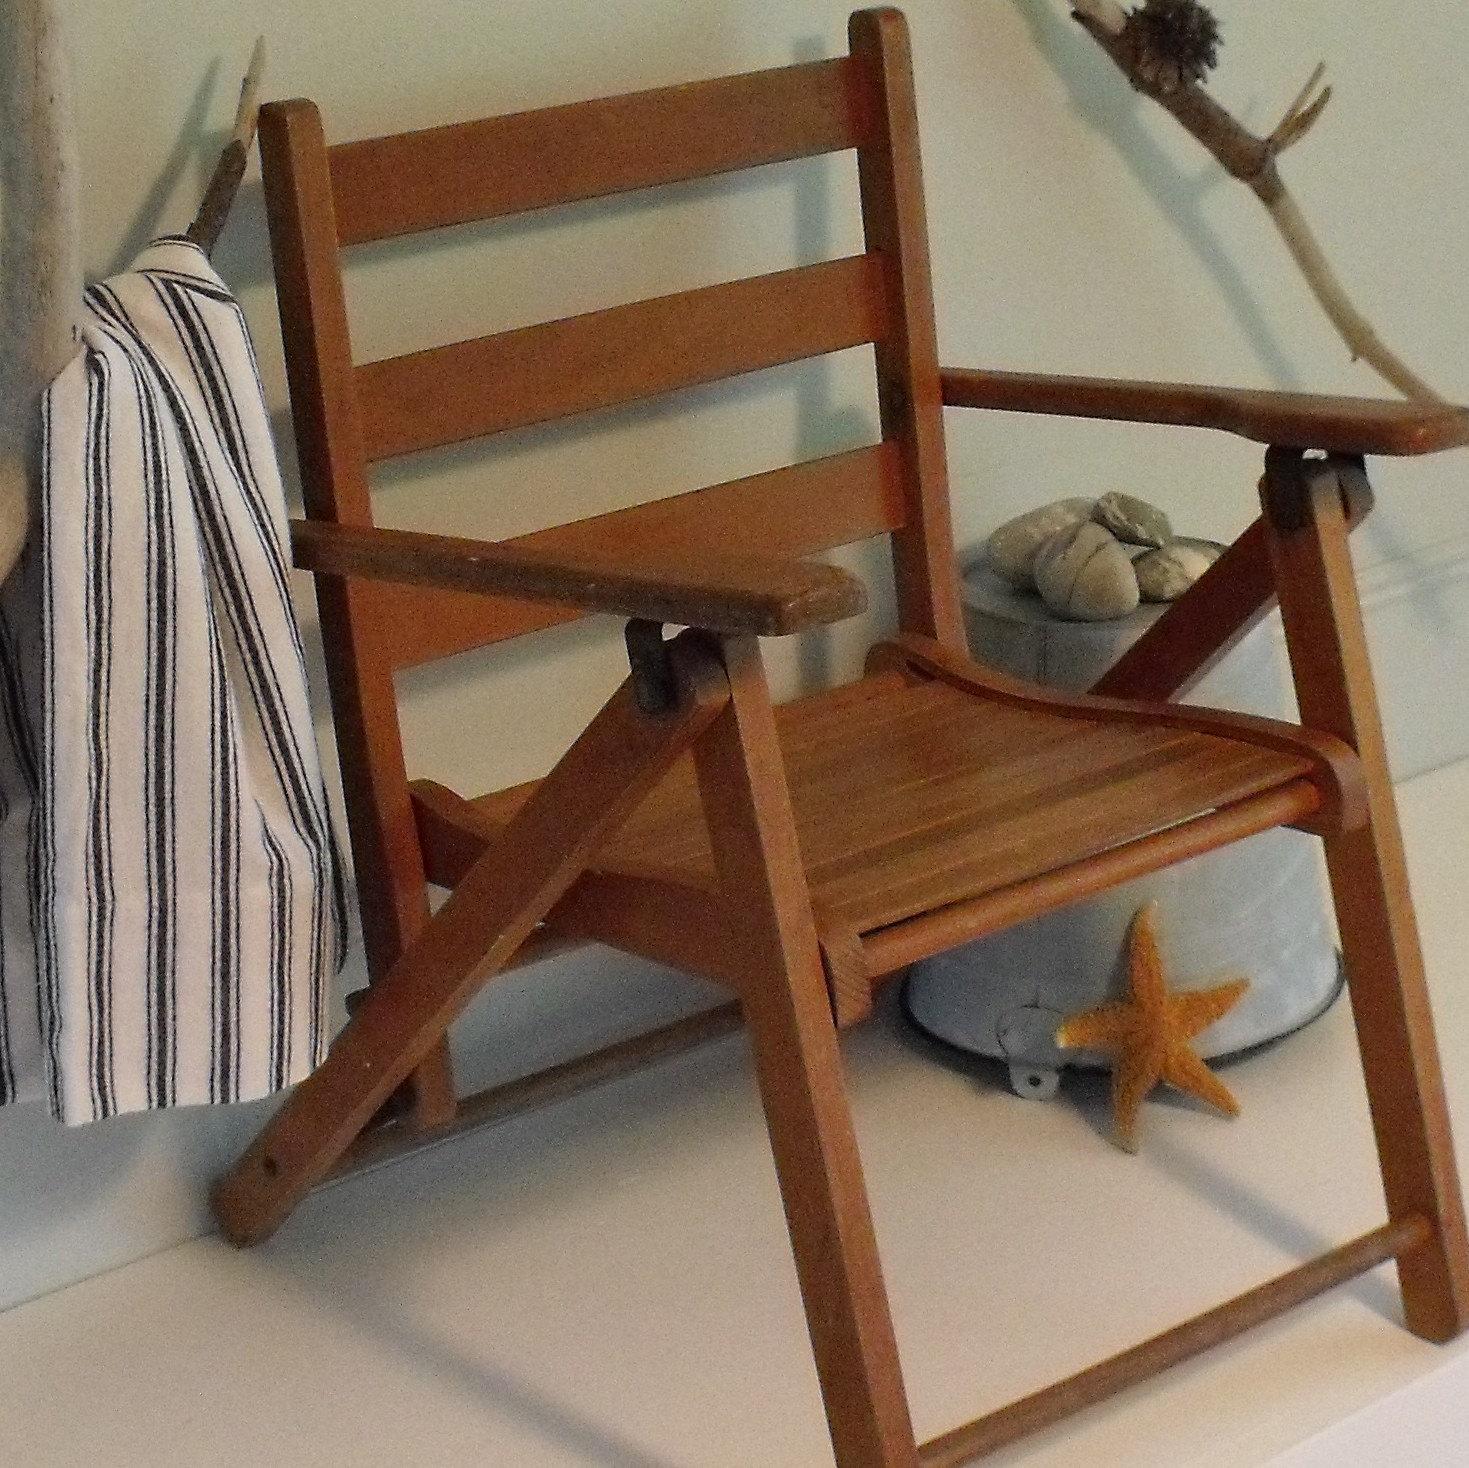 Vintage Childs Wood Folding Chair 1950 s Beach Decor